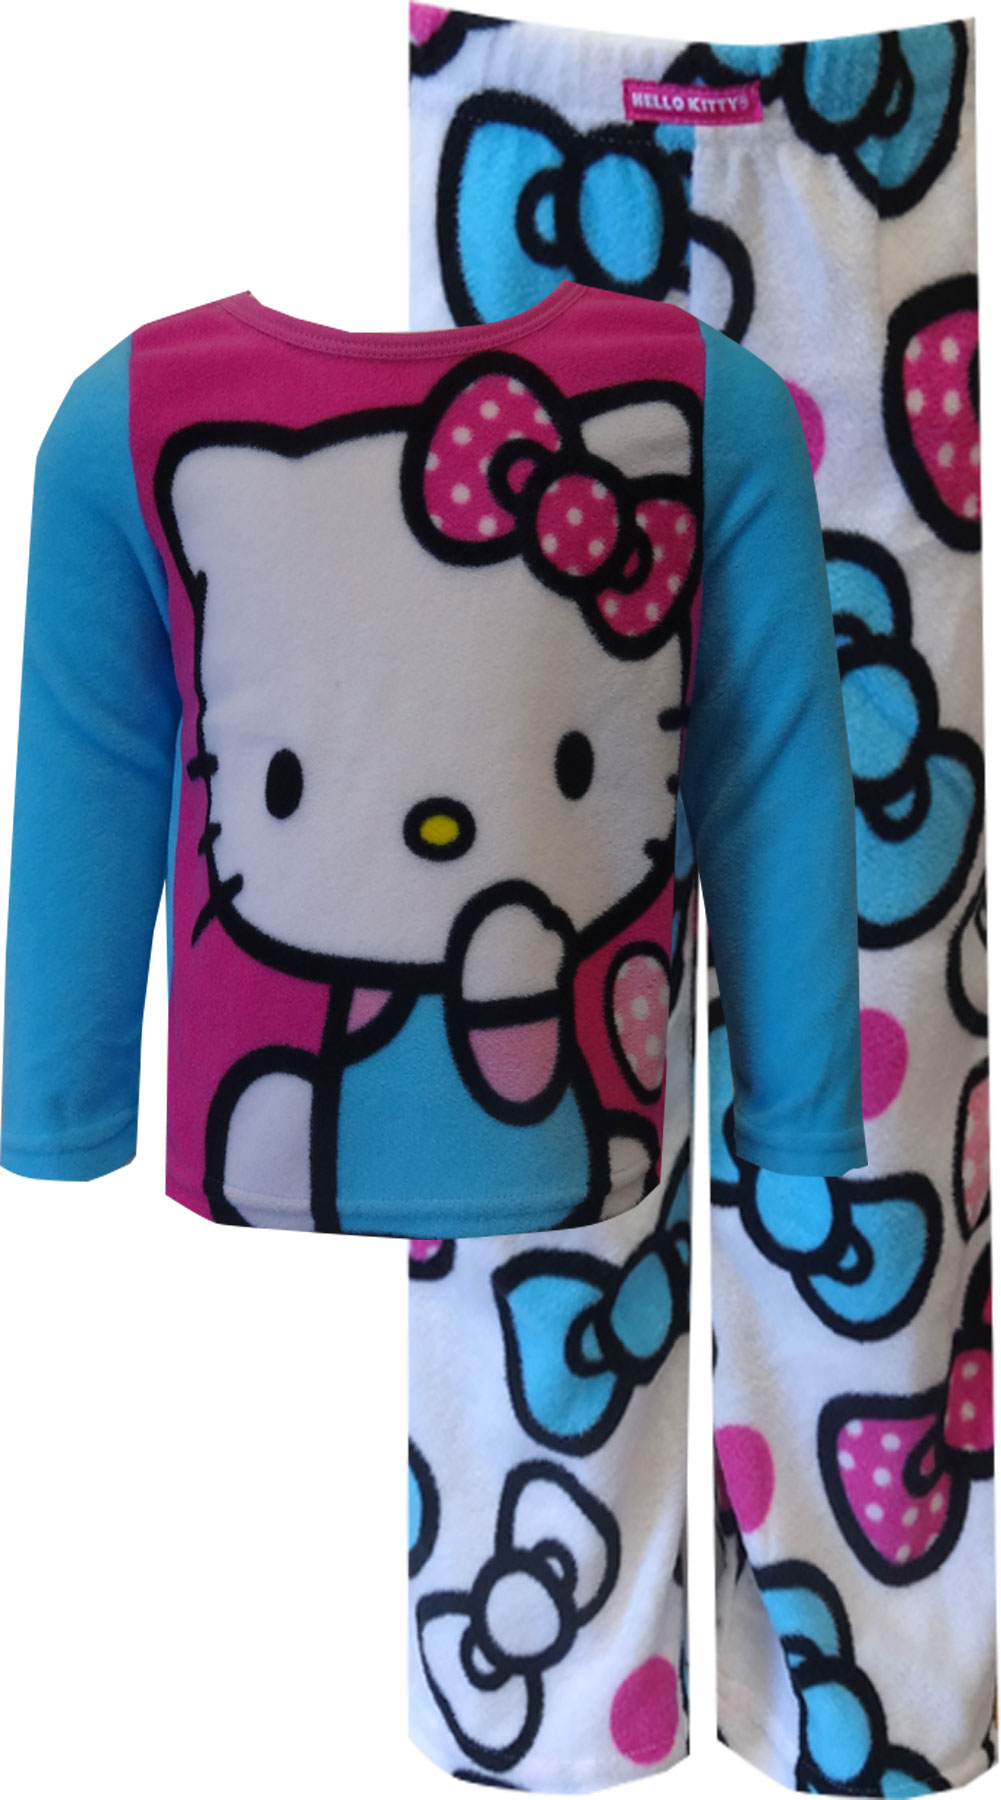 Hello Kitty Soft and Warm Fleece Pajama for girls